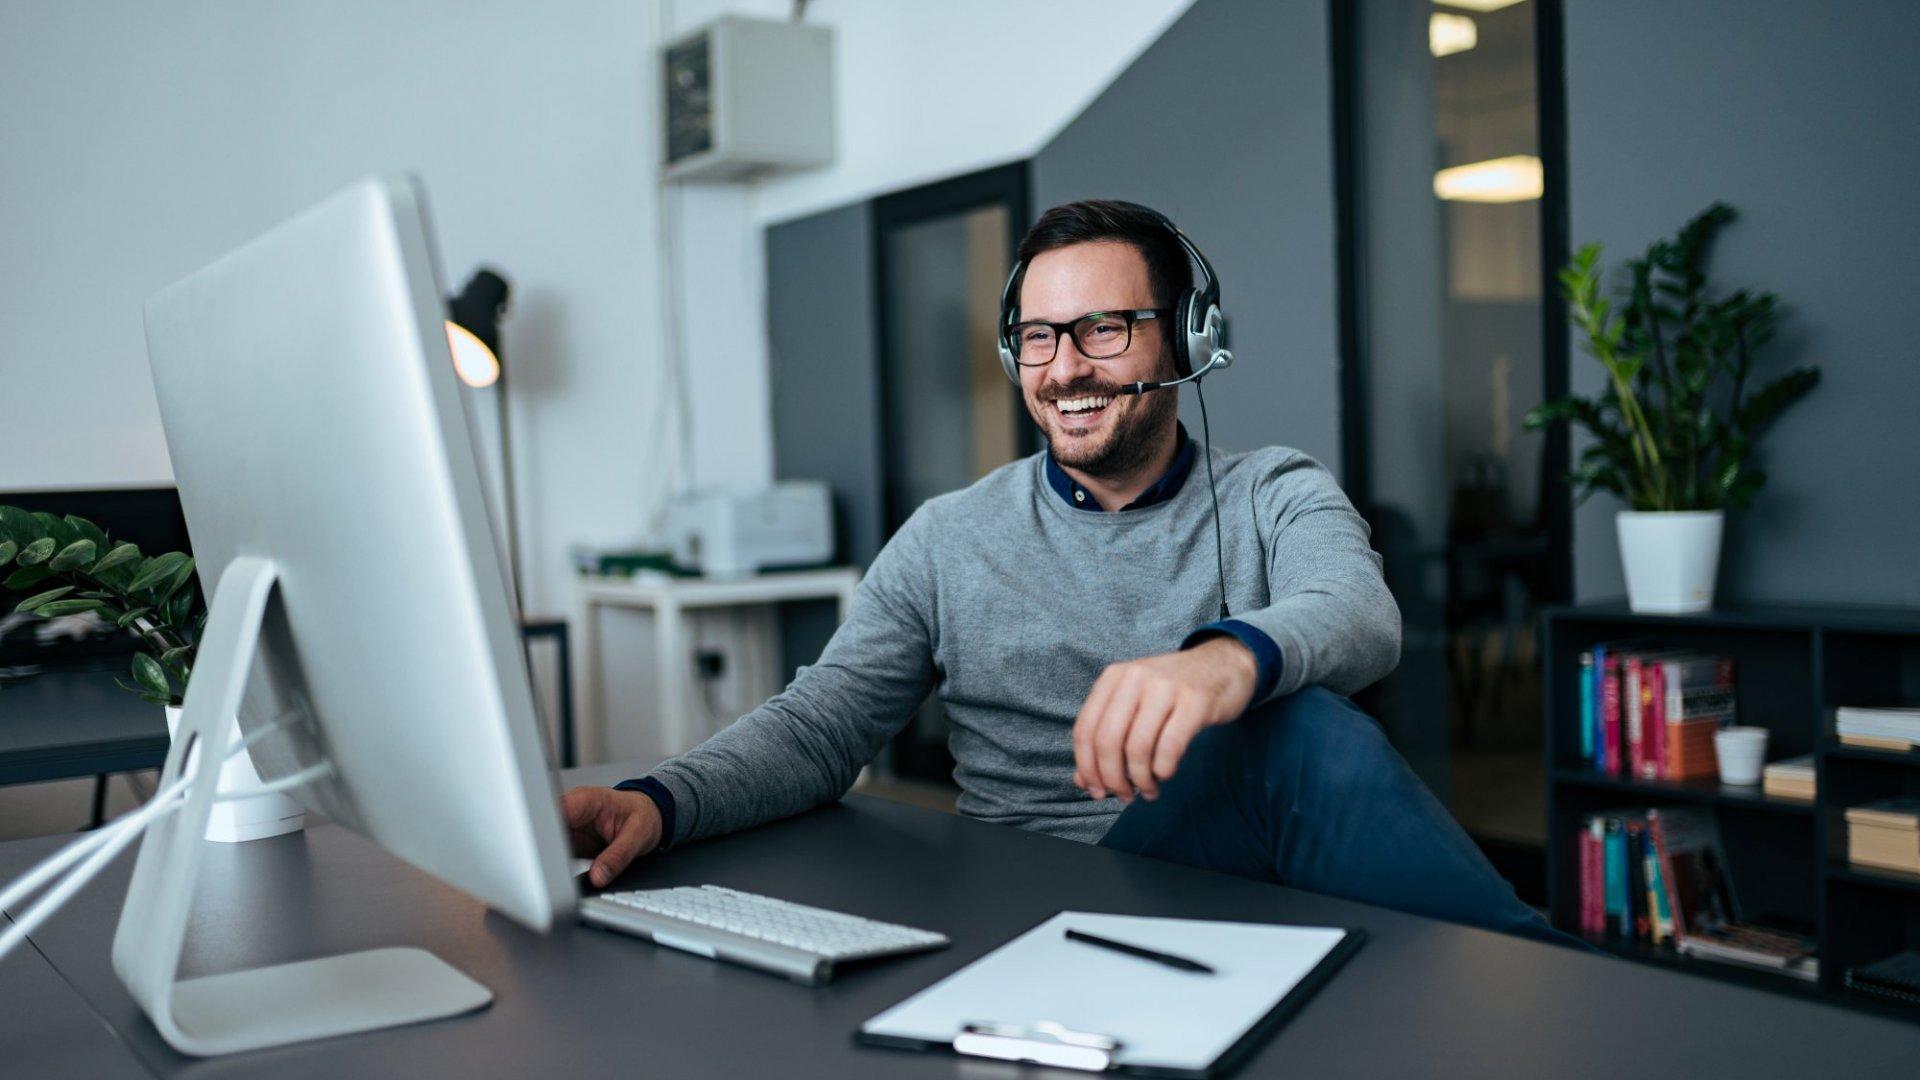 7 Ways to Run a Great Virtual Meeting